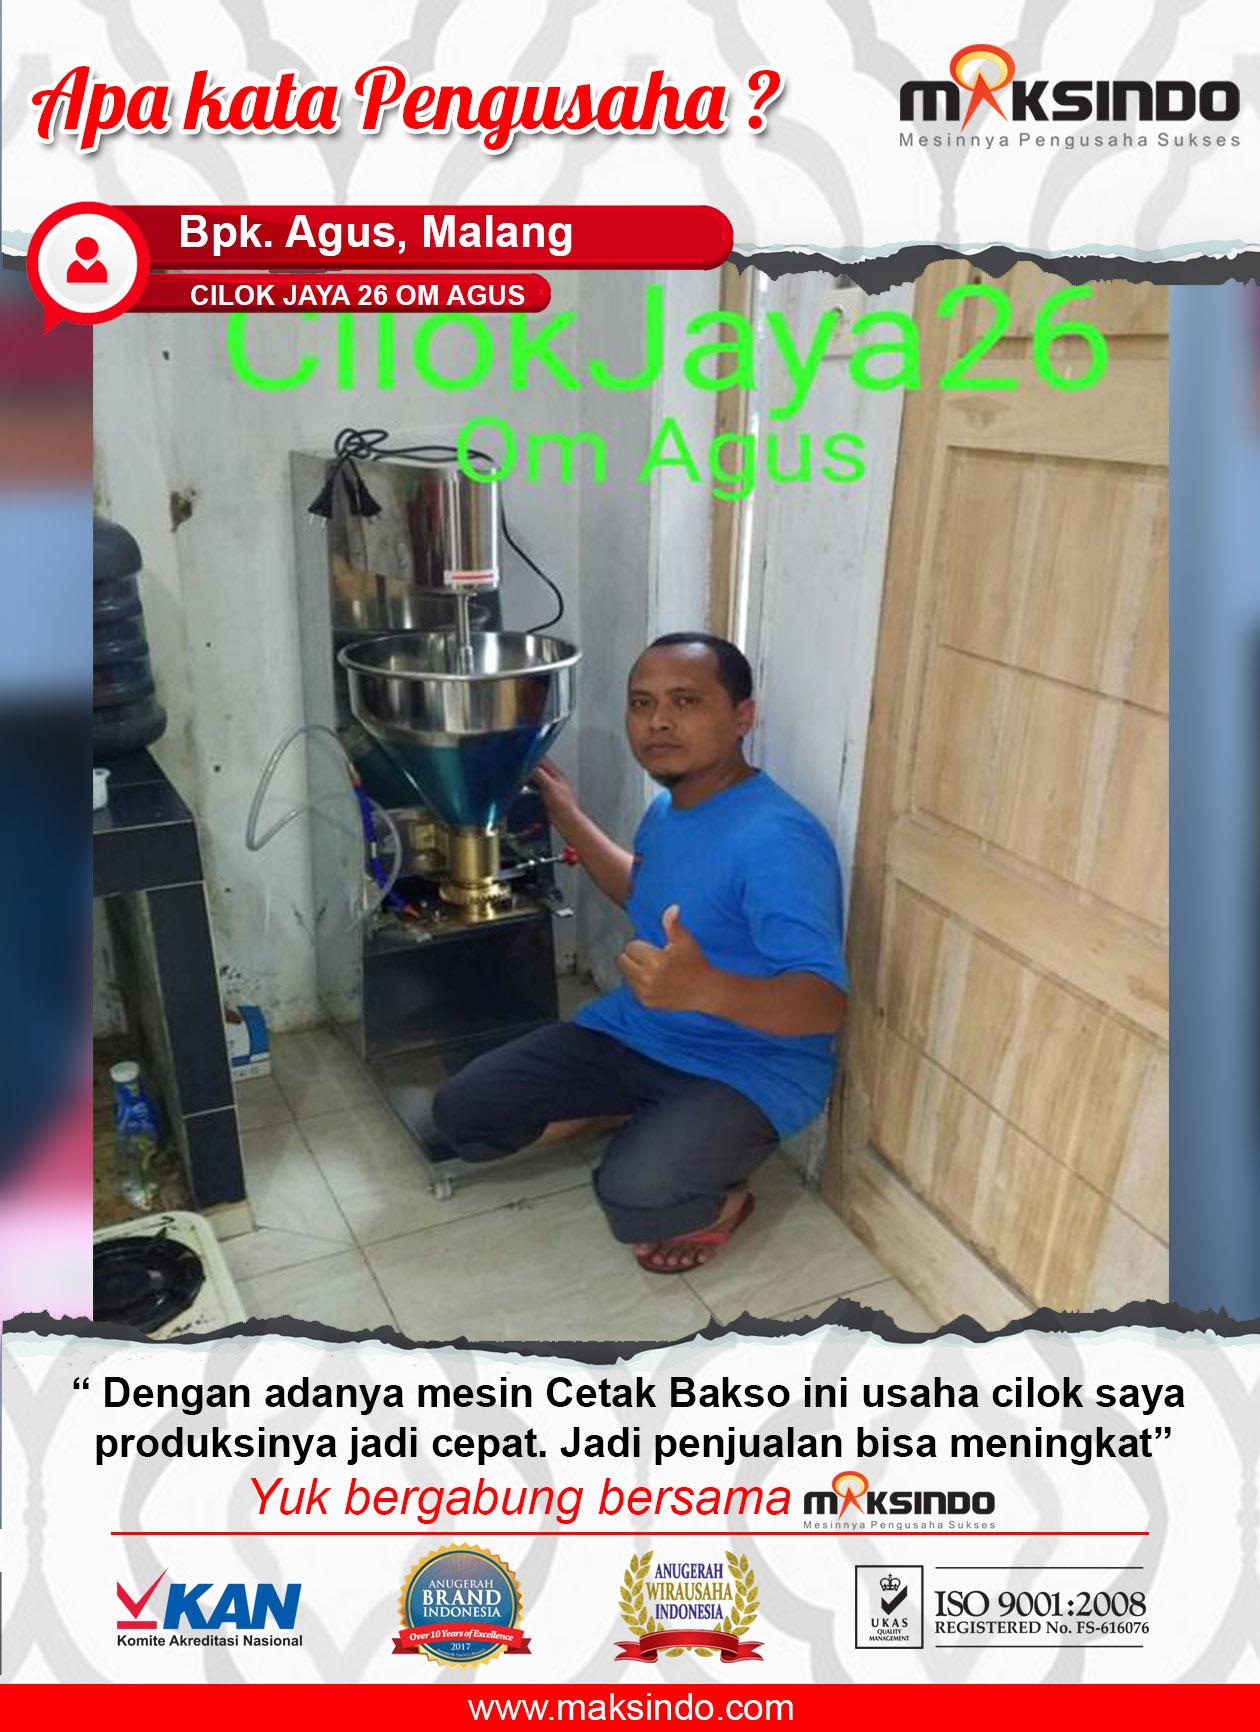 Cilok Jaya 26 Om Agus : Mesin Cetak Bakso, Produksi Cilok Lebih Cepat